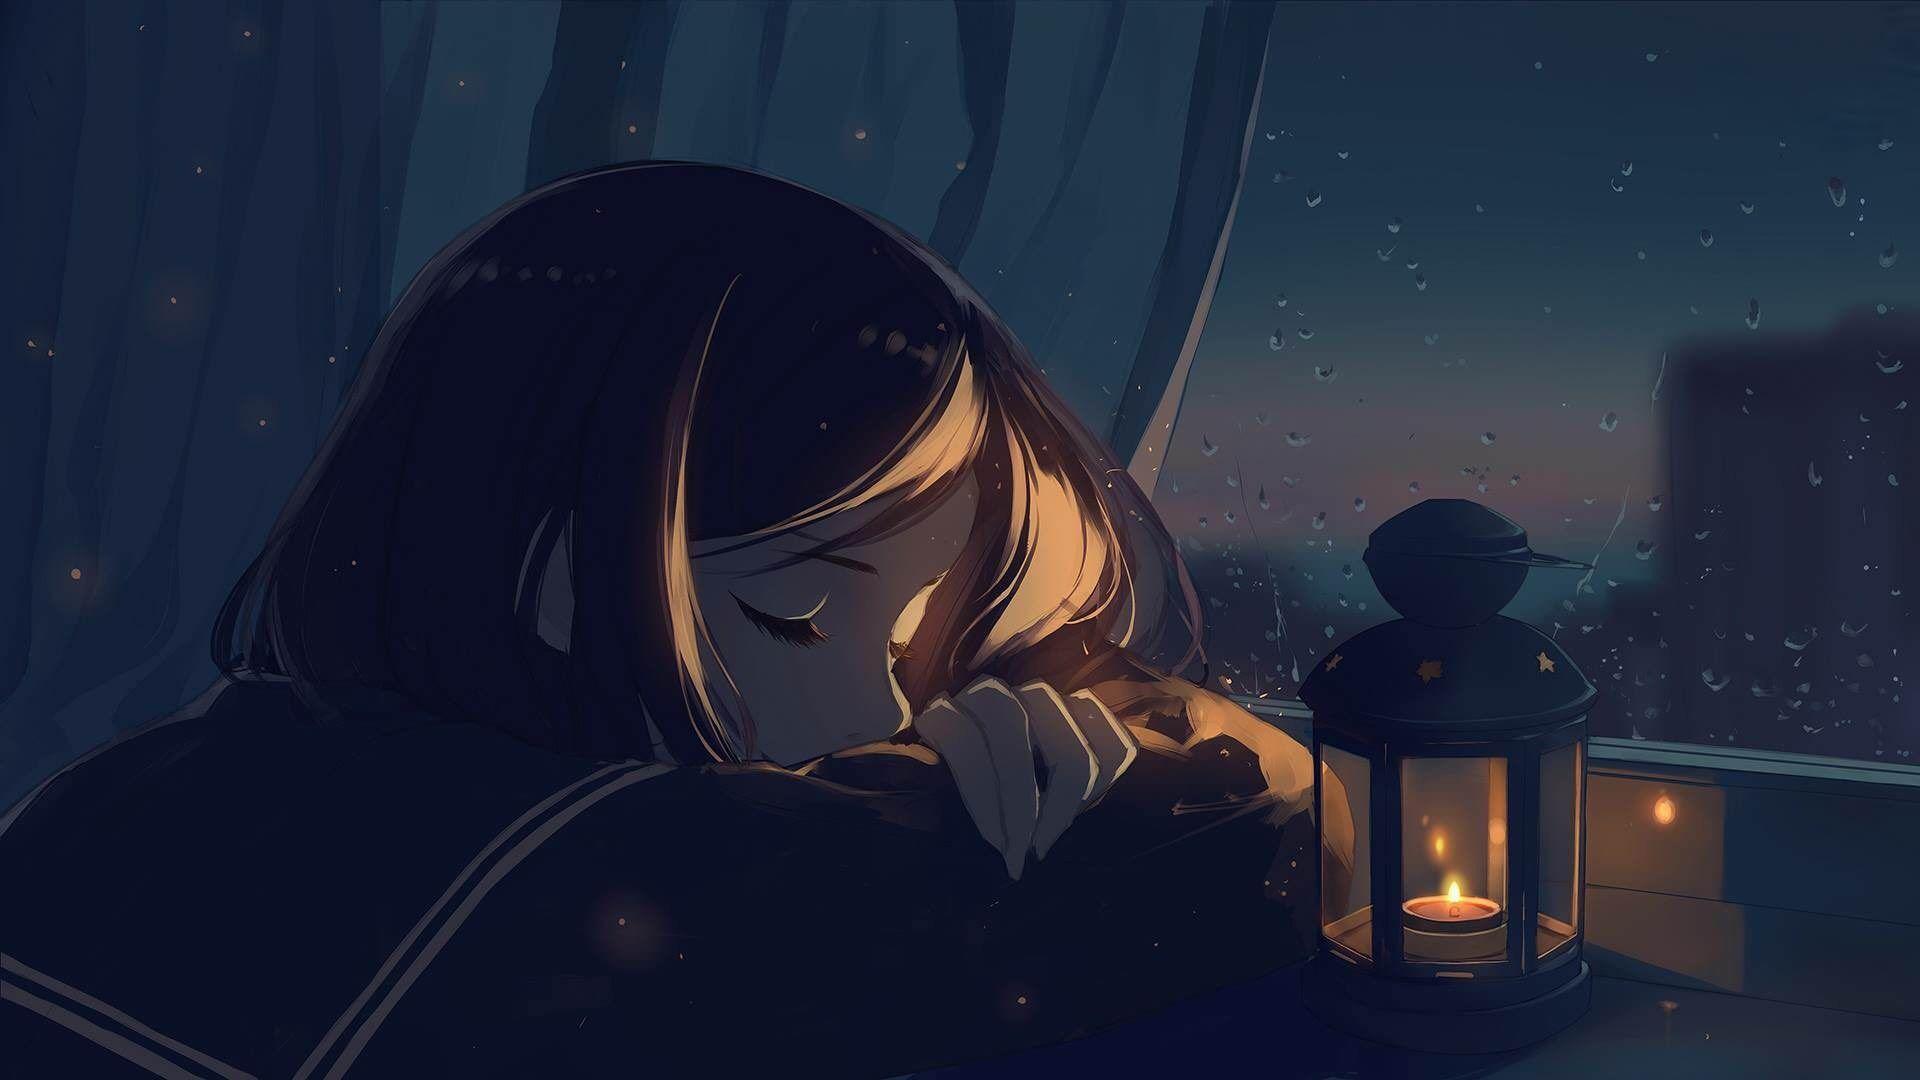 Sleeping Anime Girl Wallpapers Wallpaper Cave